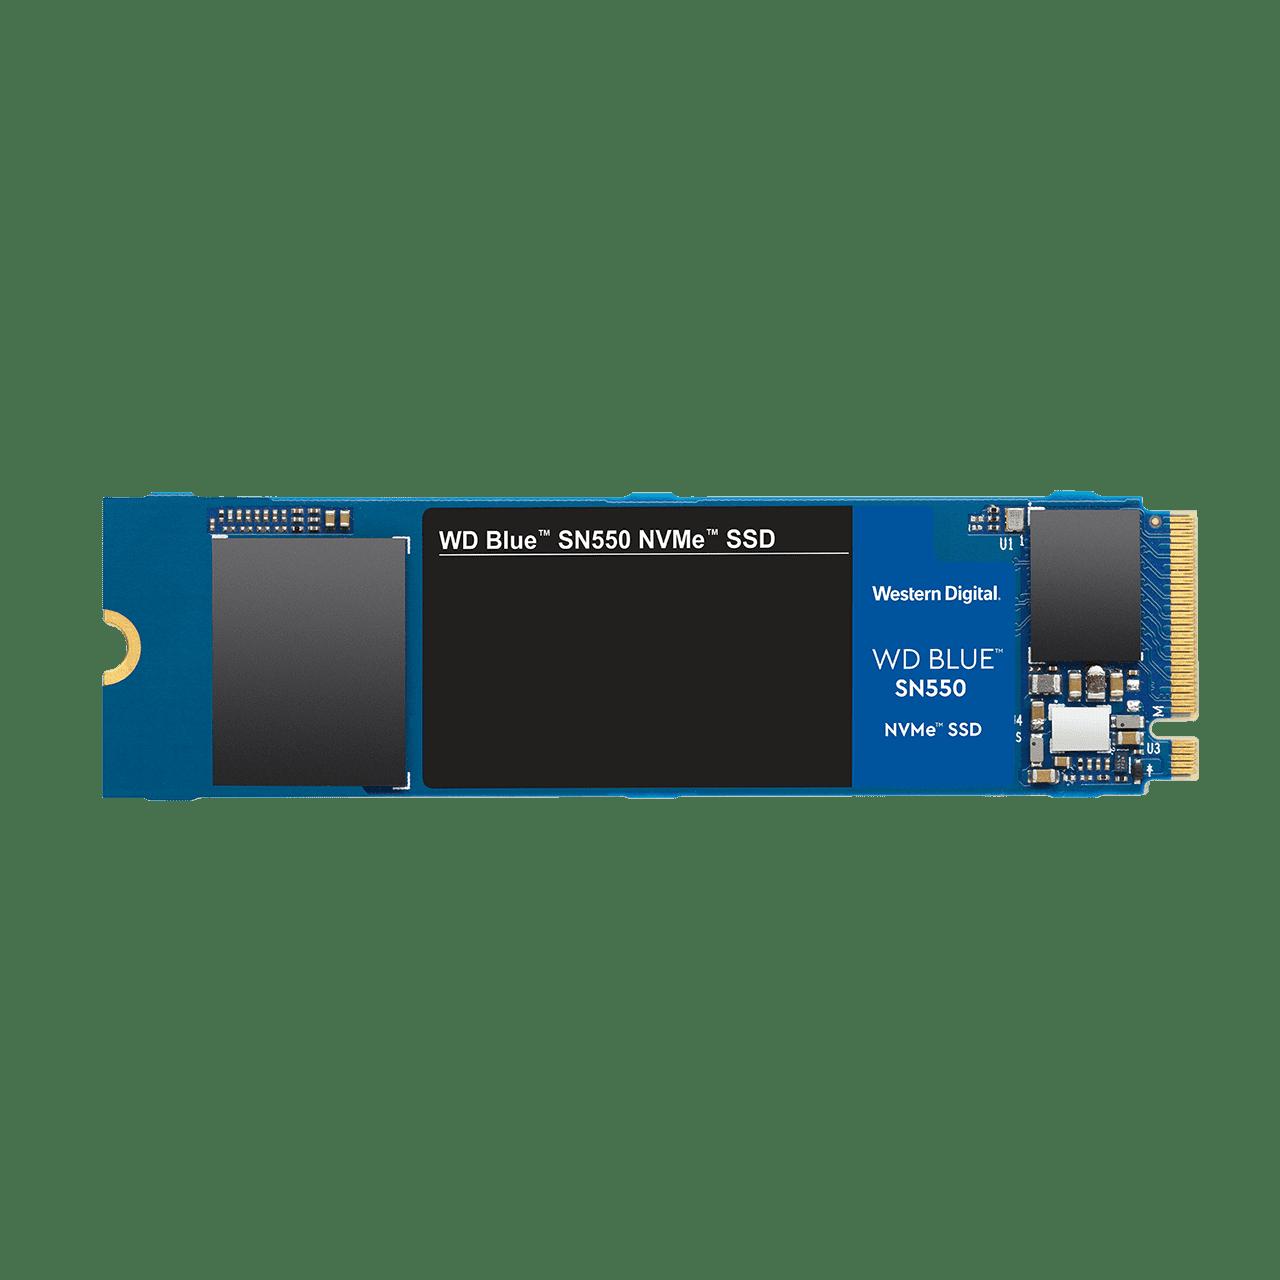 SSD 500GB WD Blue SN550 NVMe M.2 PCIe Gen3 2280